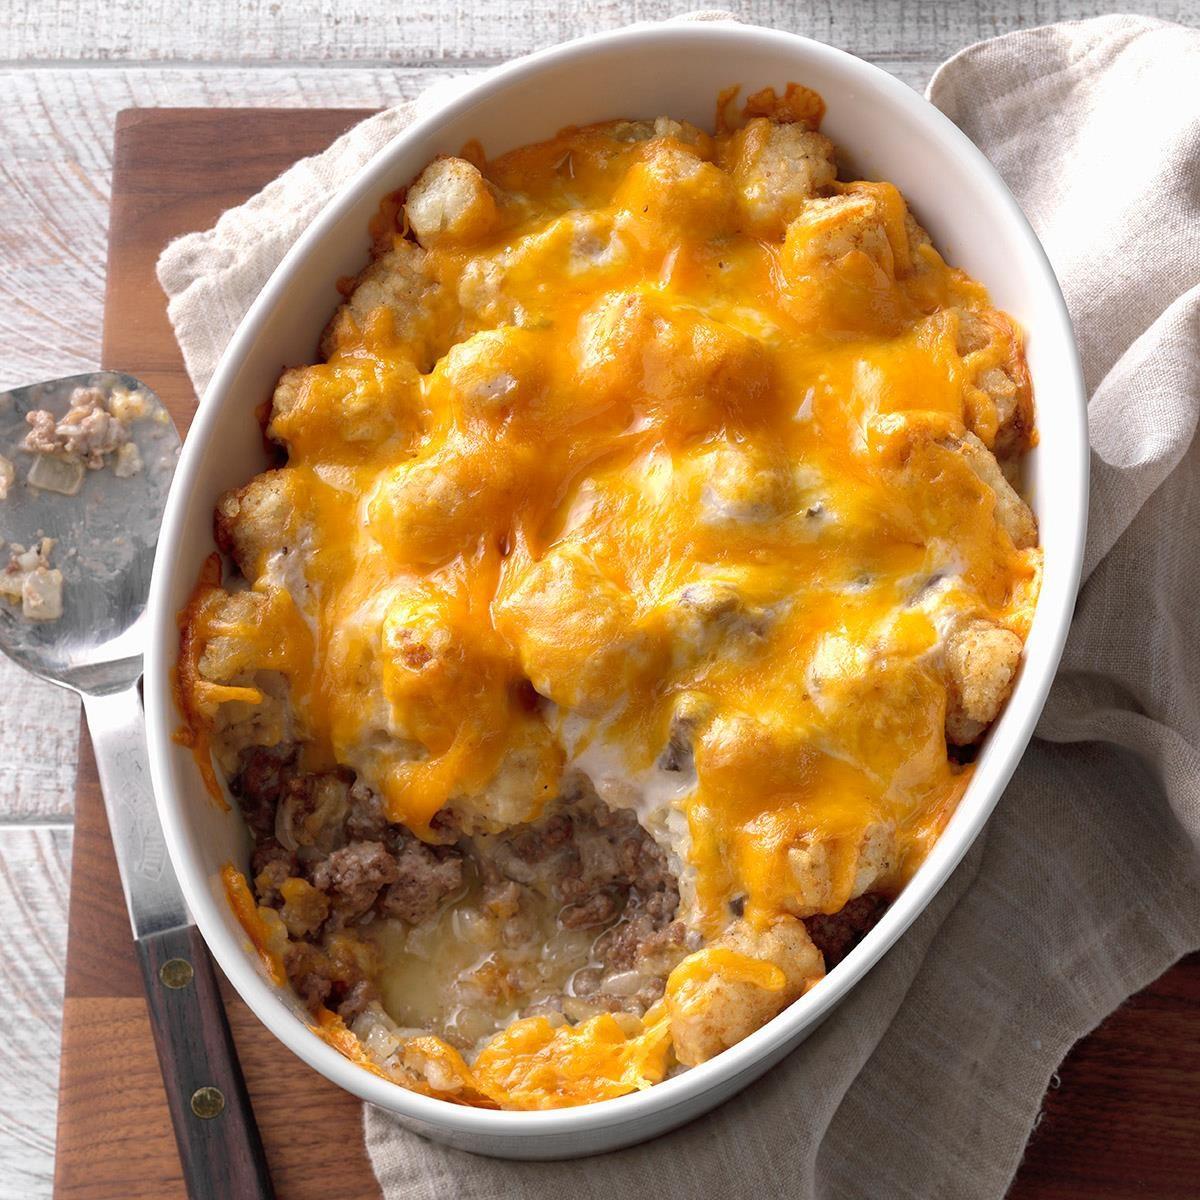 Quick Tater Tot Bake Recipe | Taste of Home